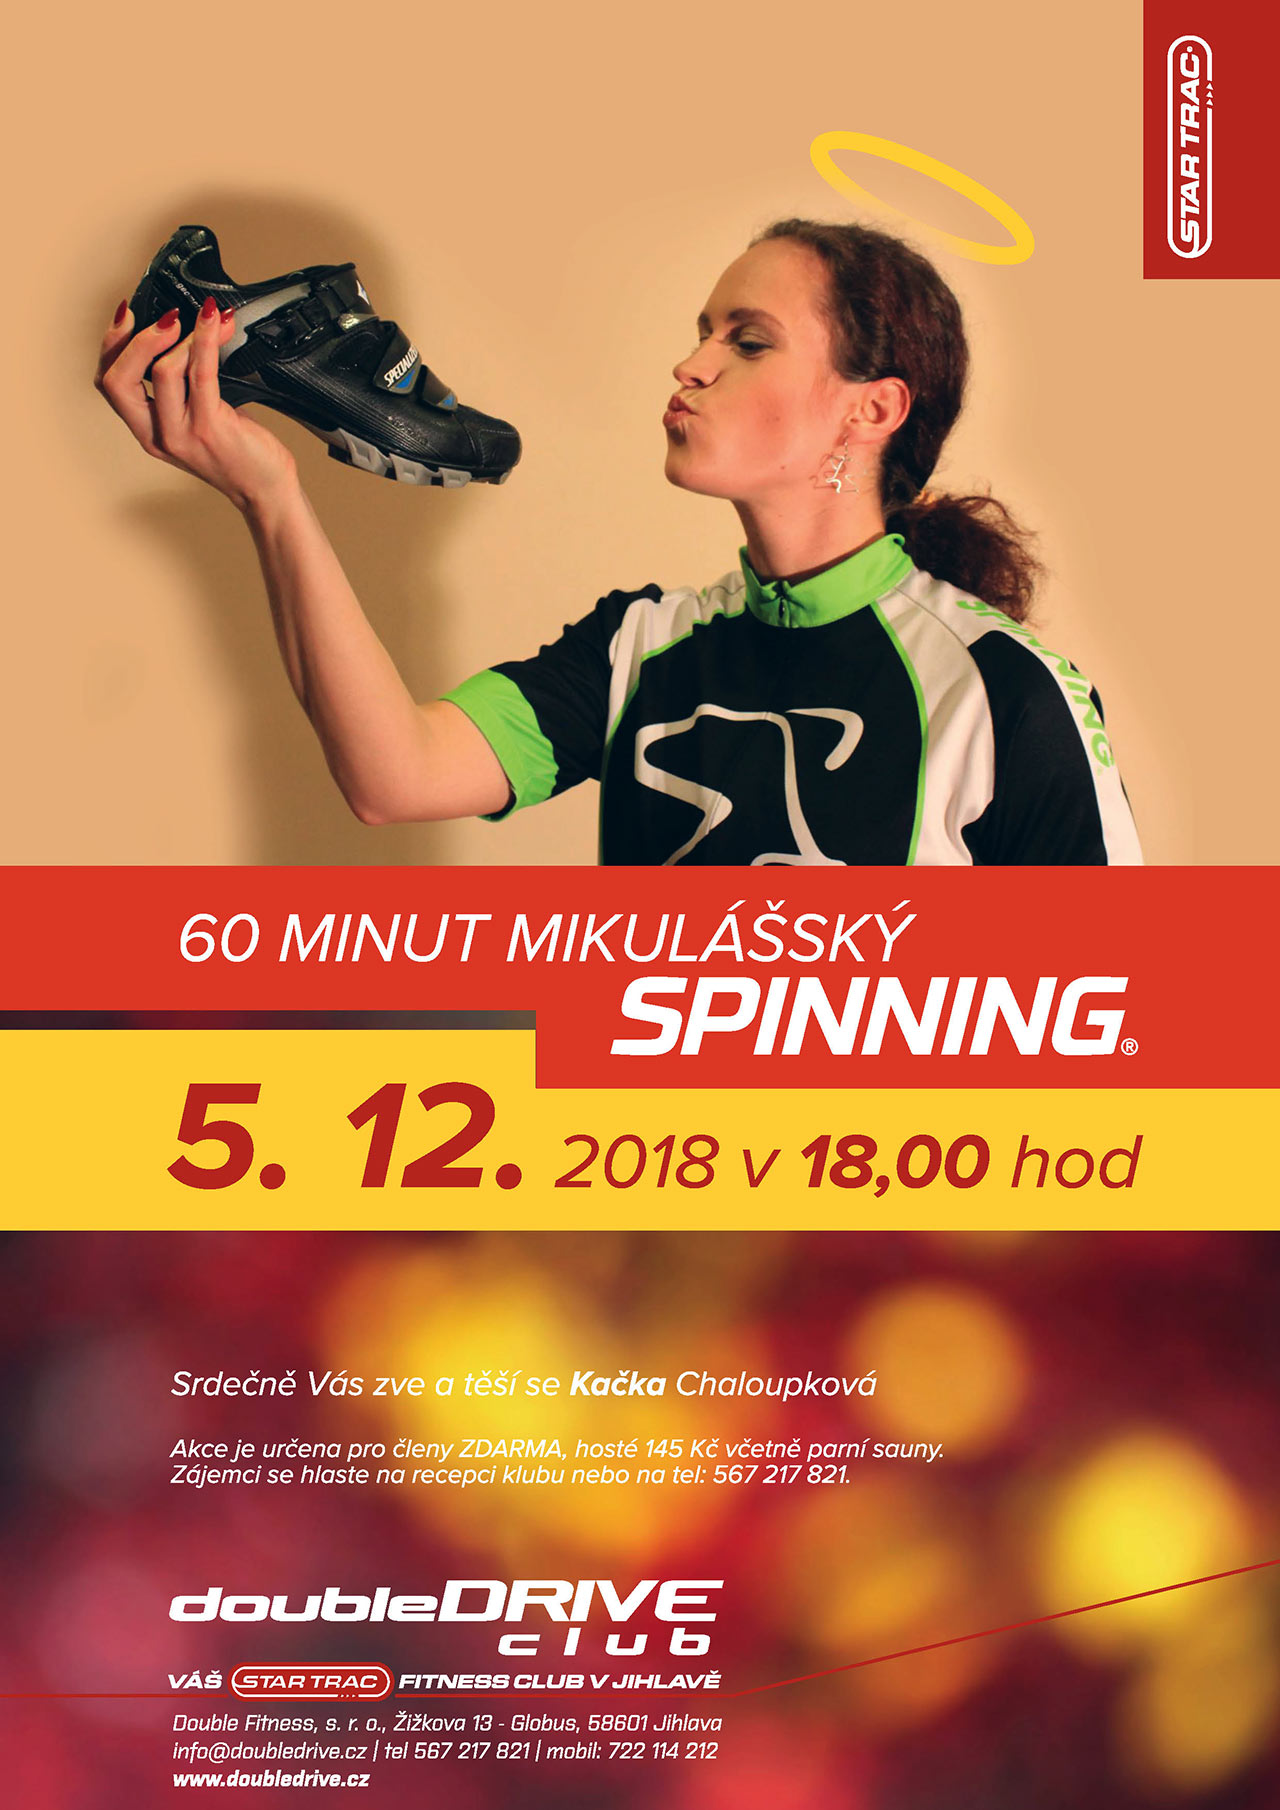 Ddc 20181205 Spin